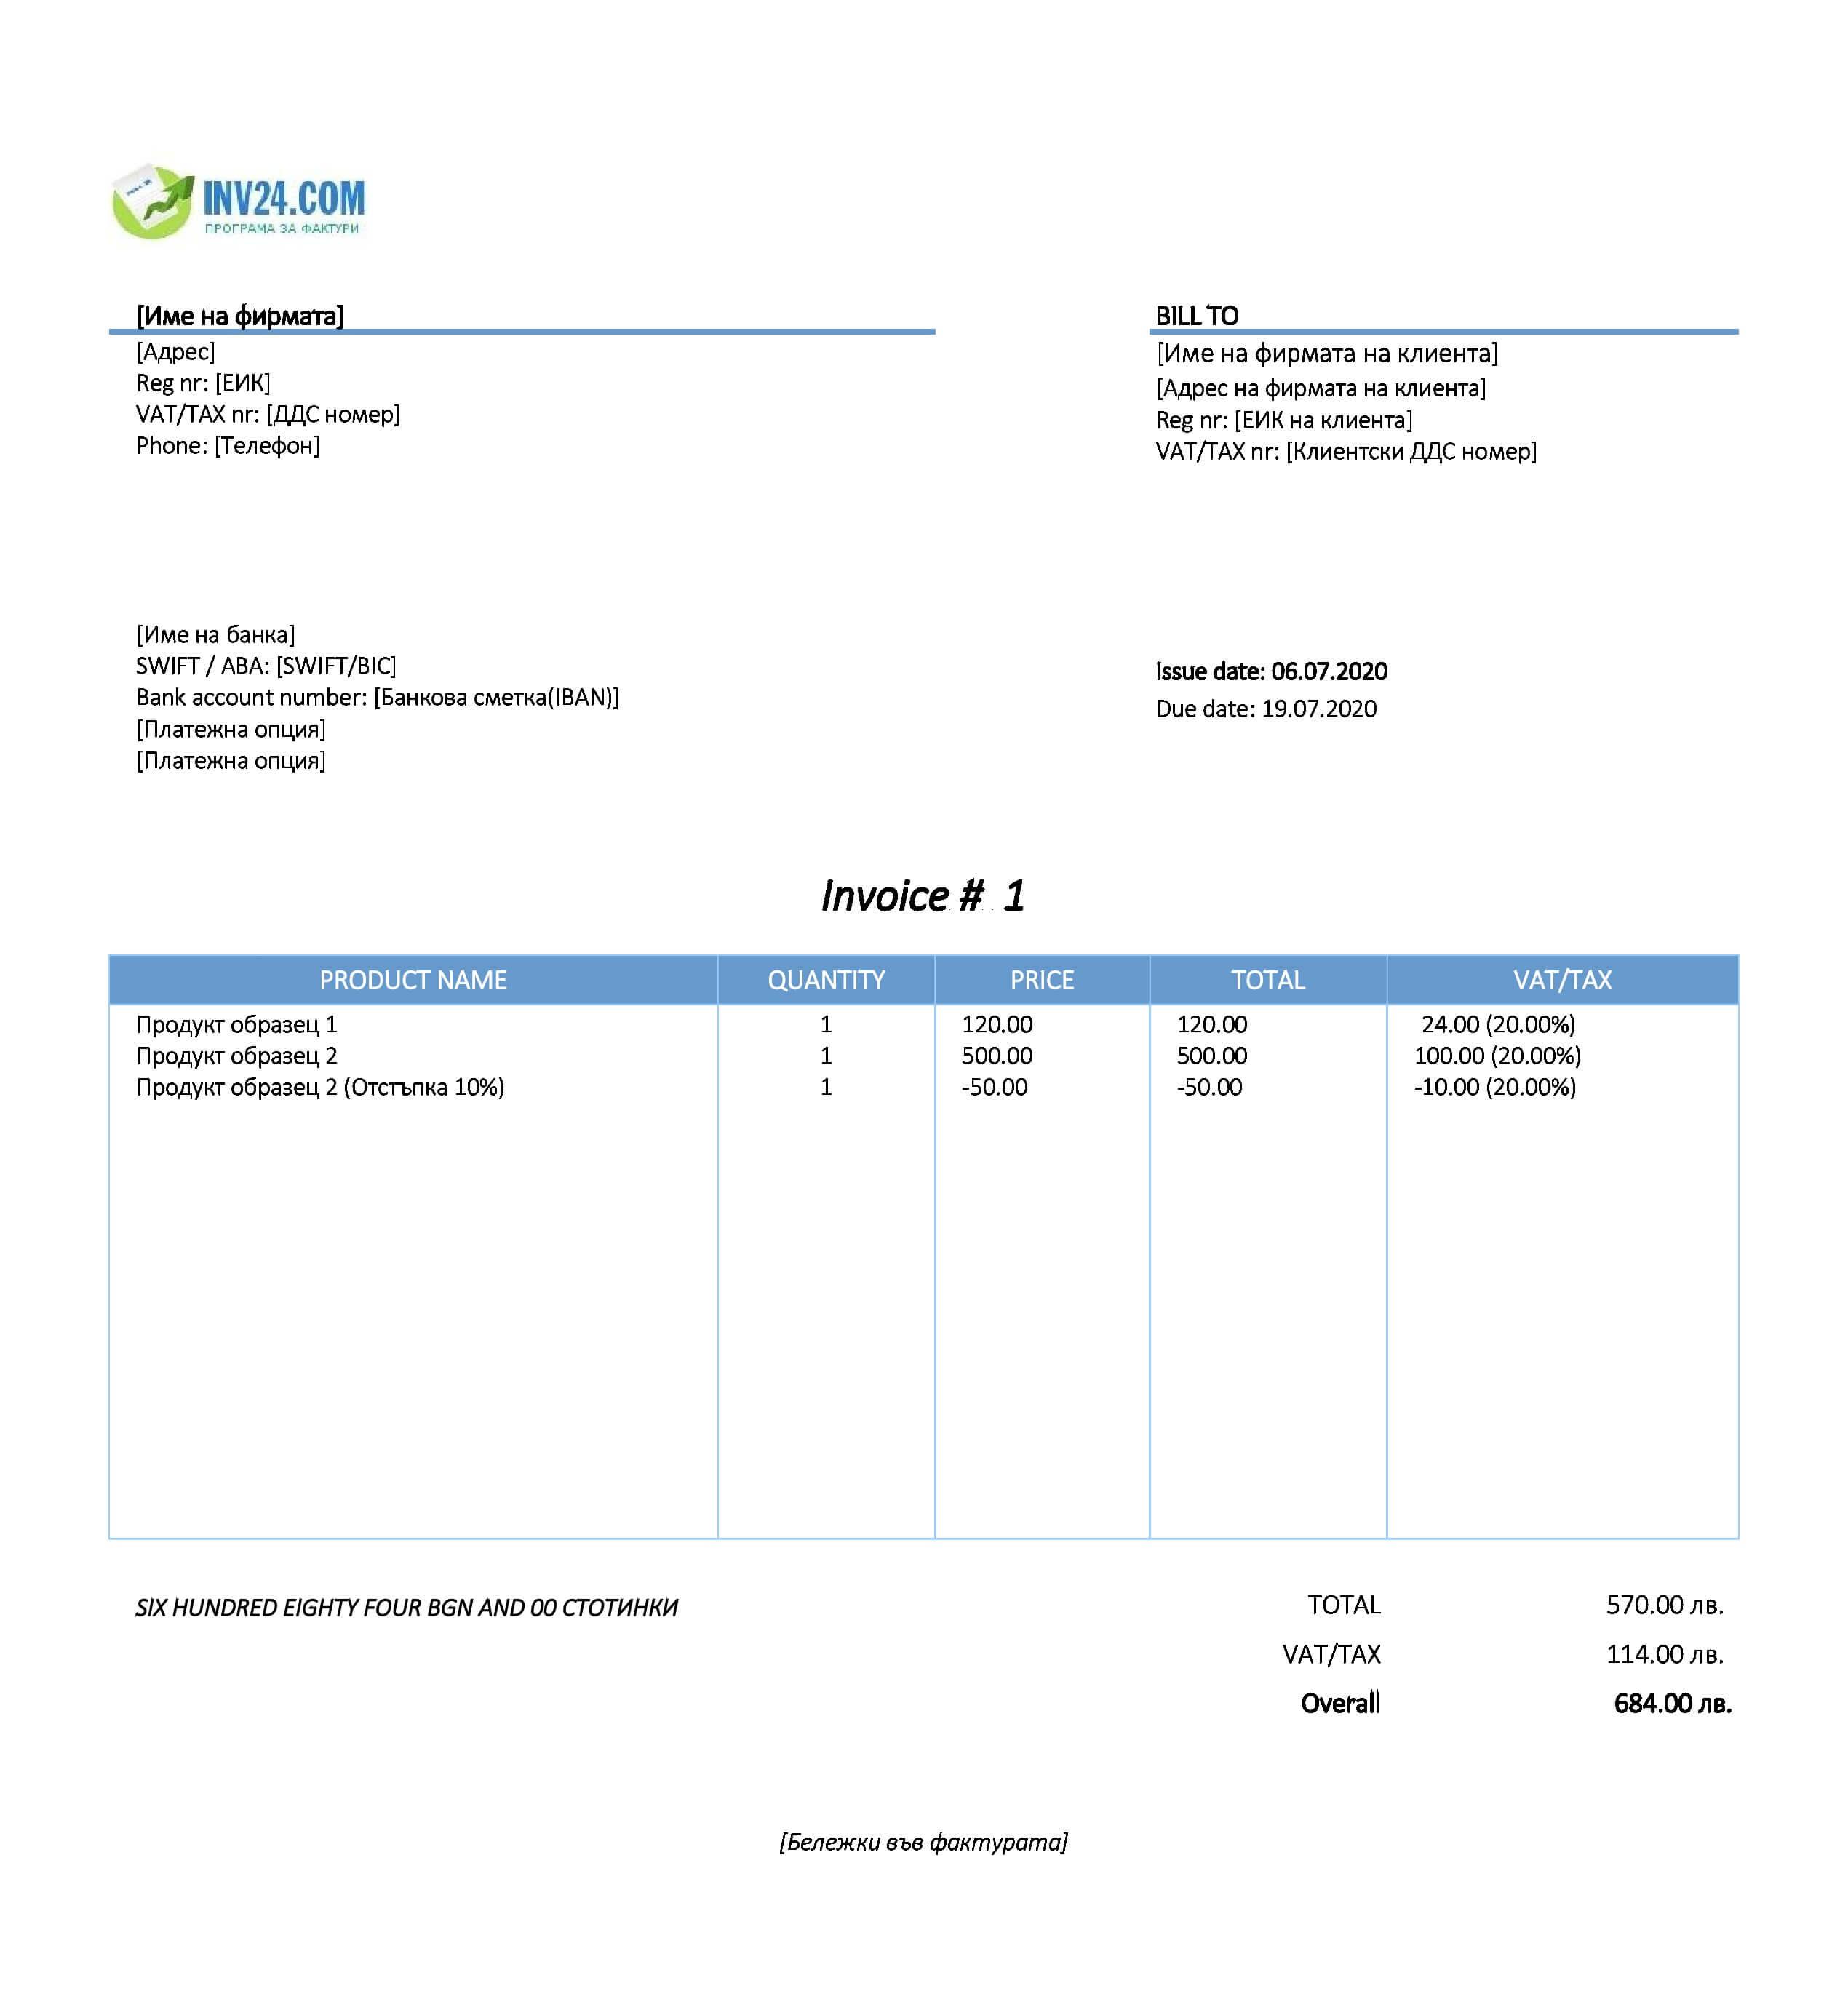 бланка за инвойс фактура